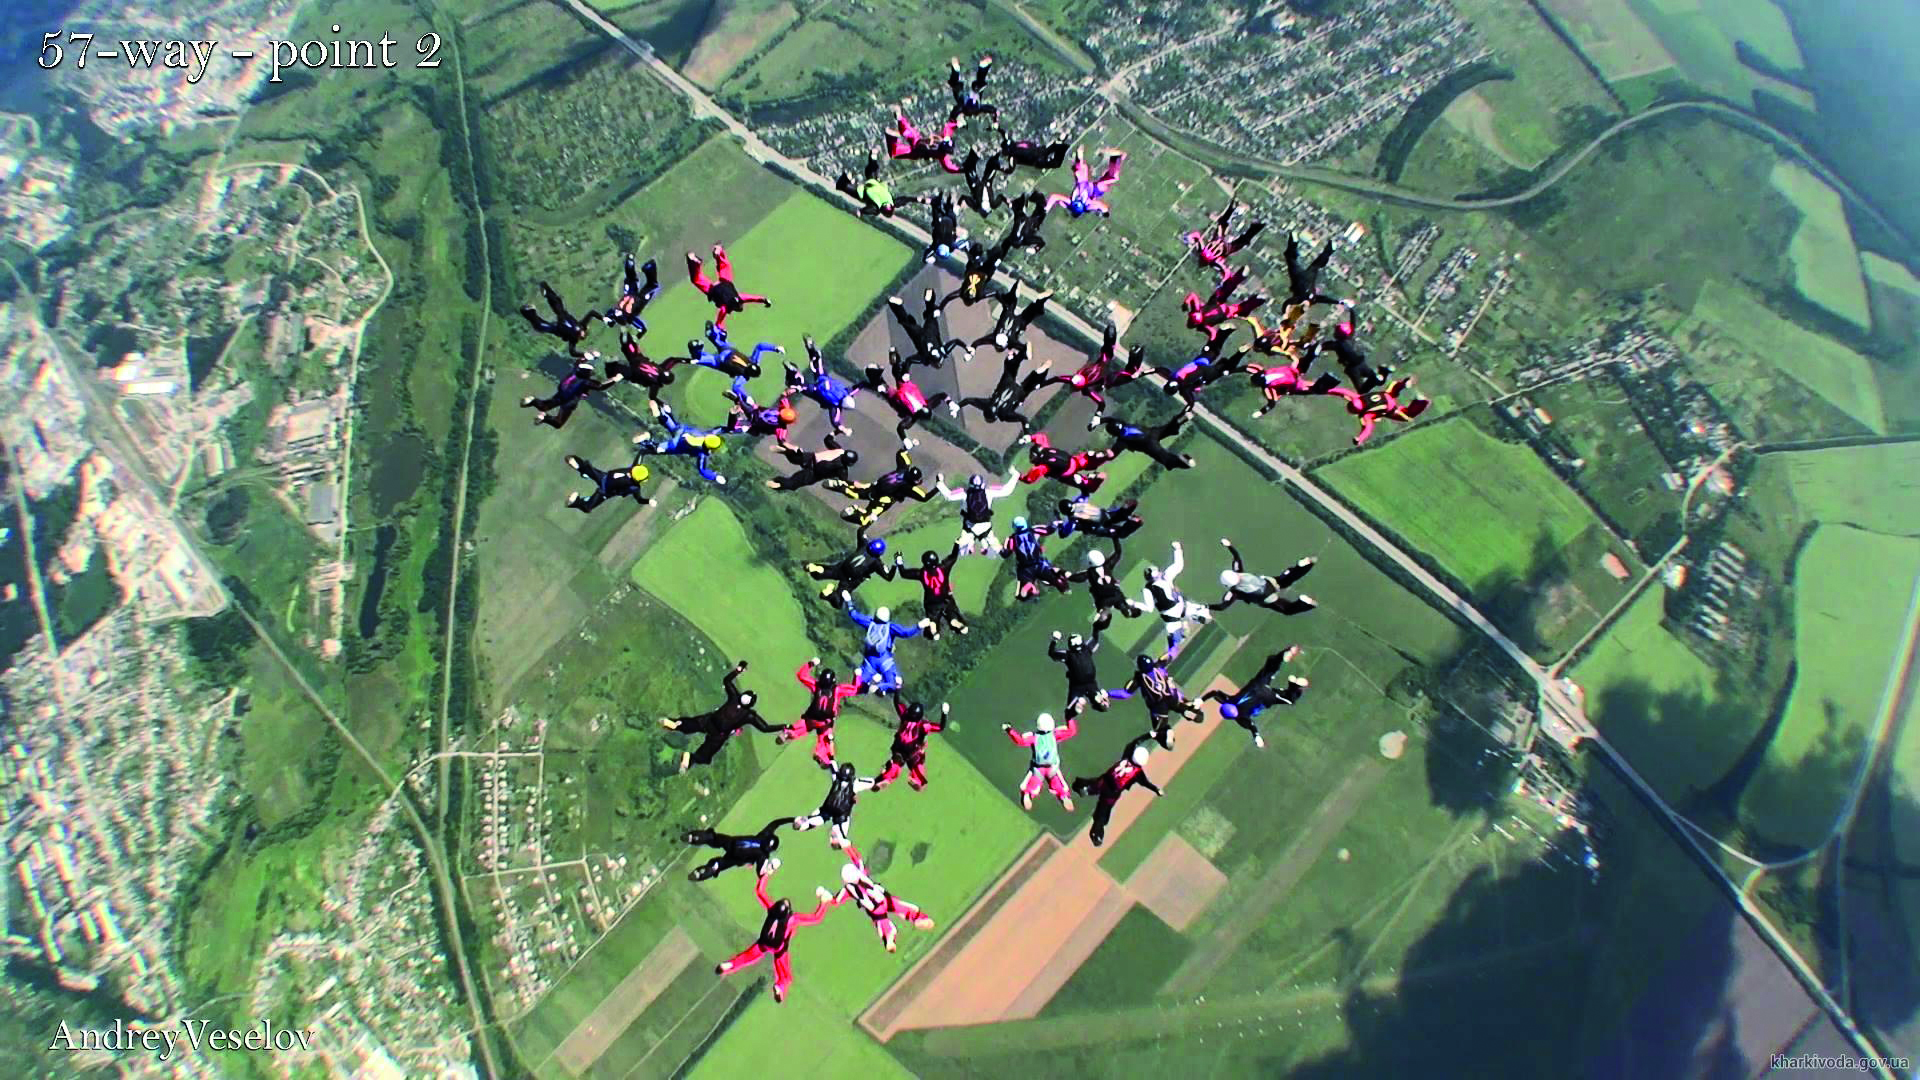 New Skydiving Record Set in Ukraine!